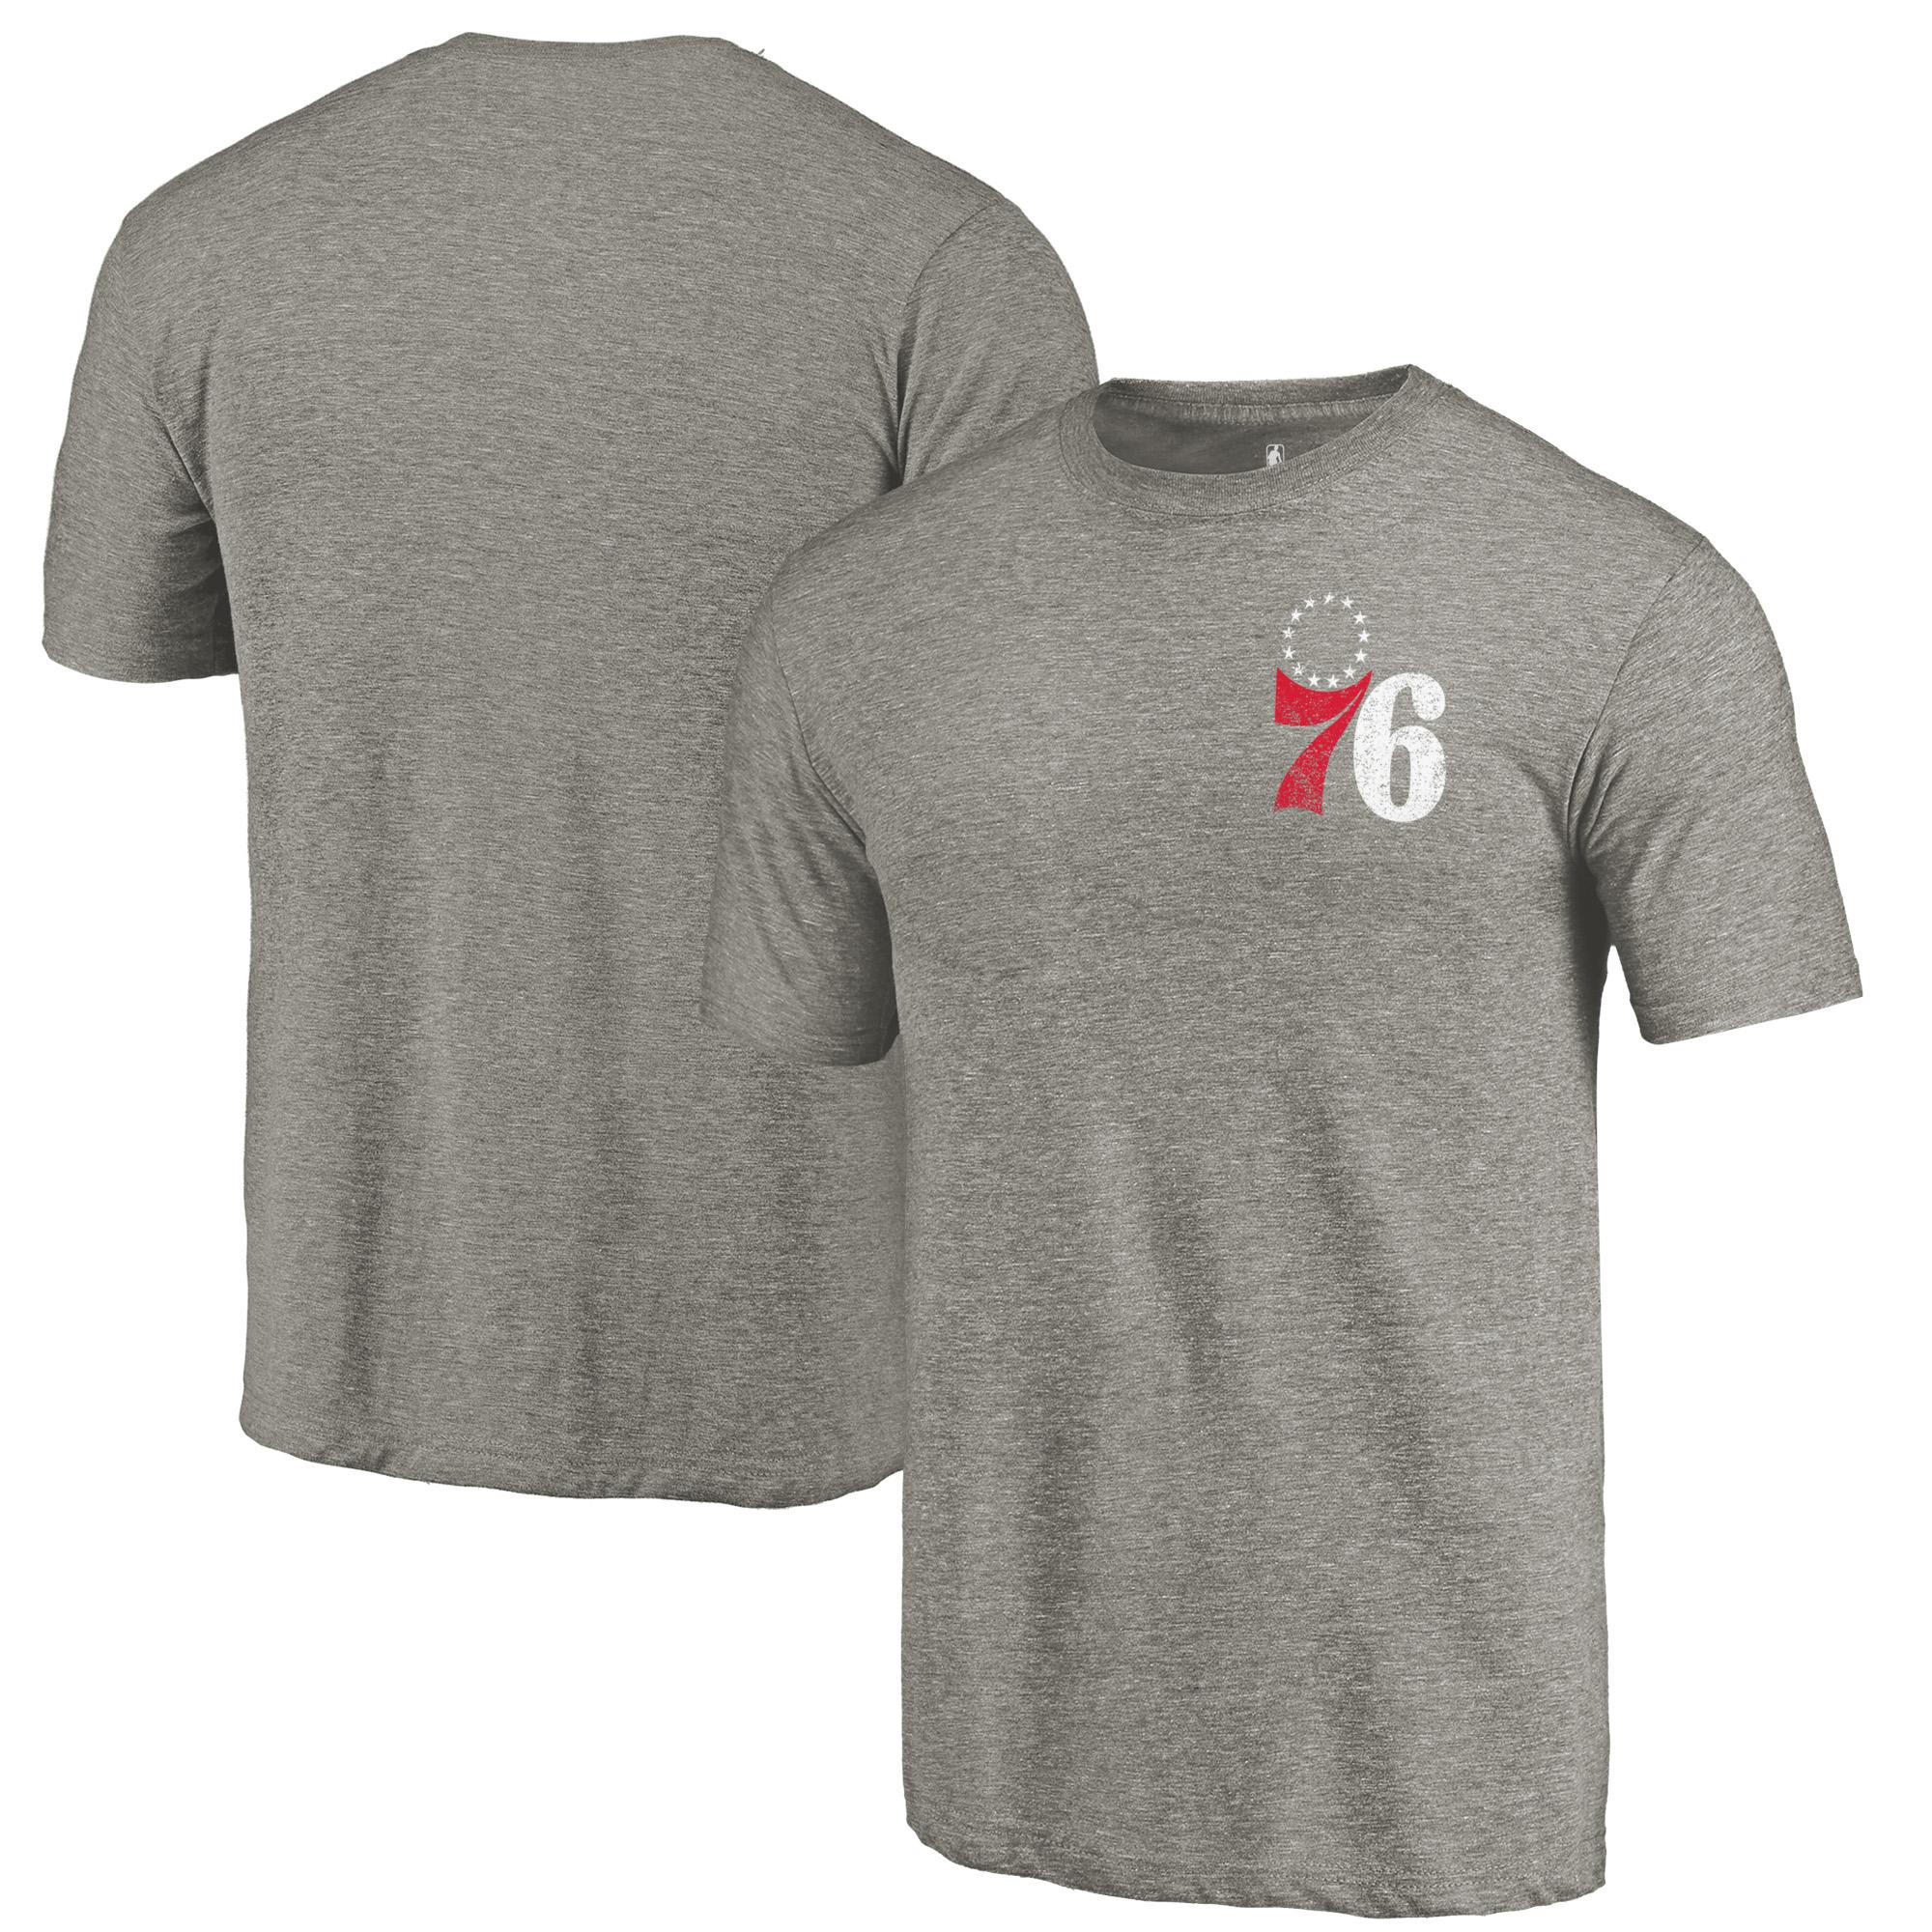 Philadelphia 76ers Fanatics Branded Primary Logo Left Chest Distressed Tri-Blend T-Shirt - Gray